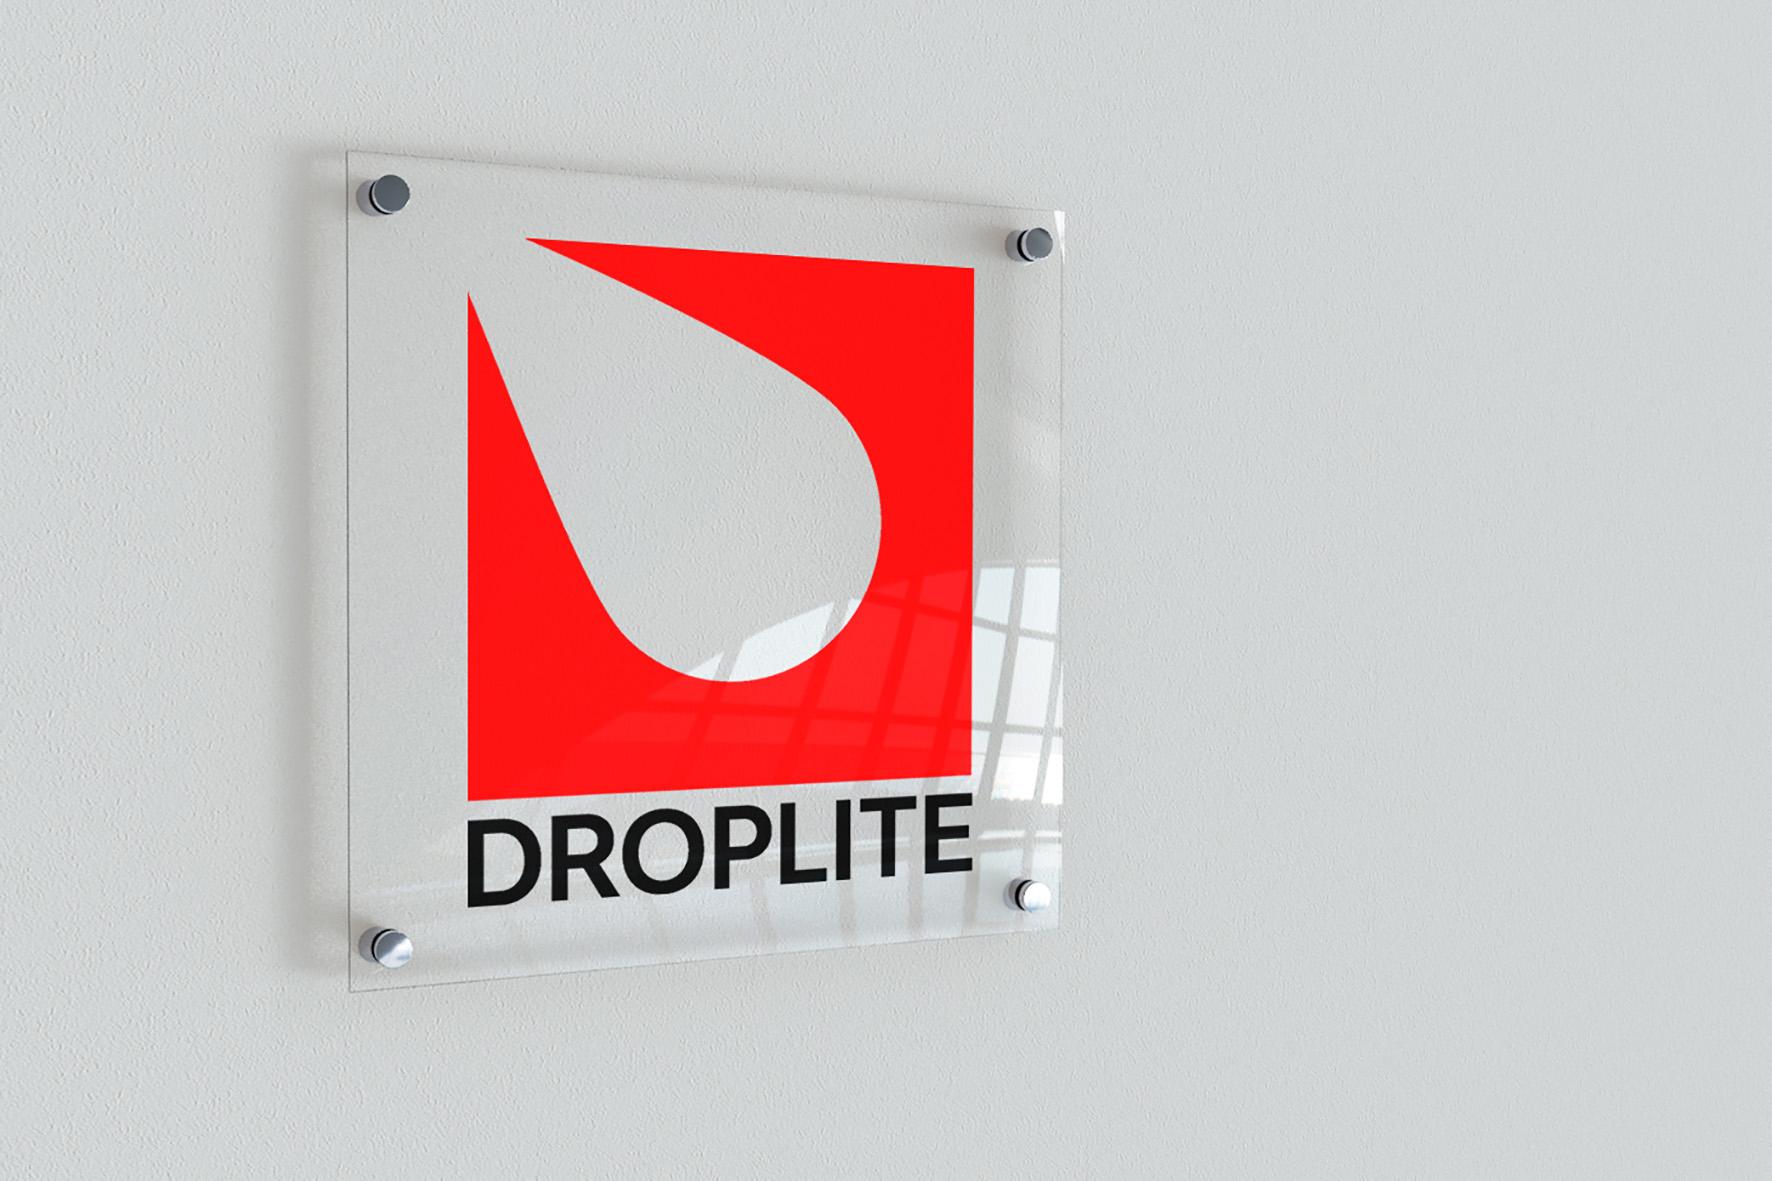 Signage-Droplite-Daniel-Cavalcanti